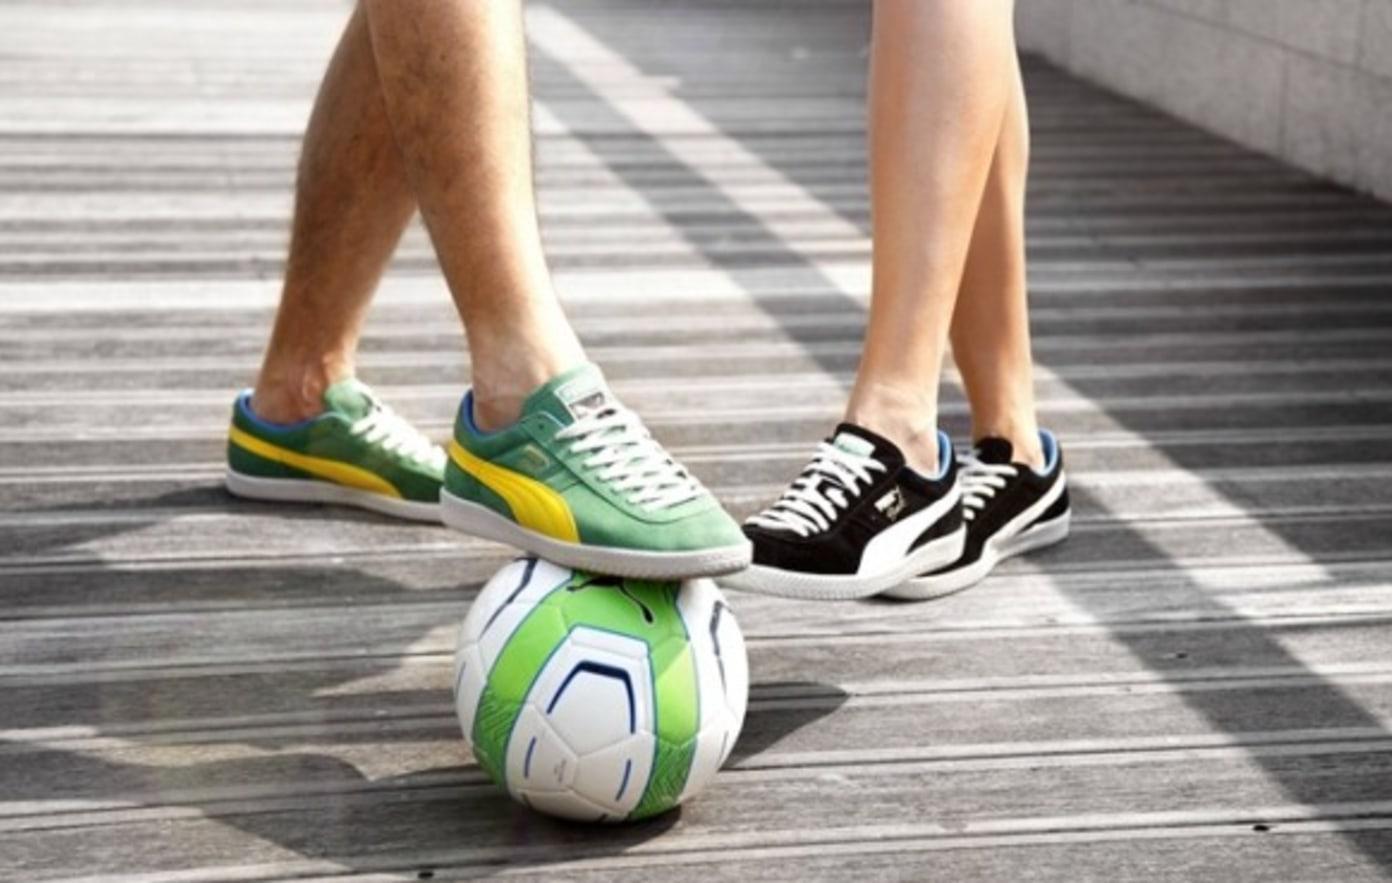 Puma Celebrates the 2014 FIFA World Cup with the Return of the Puma Brasil